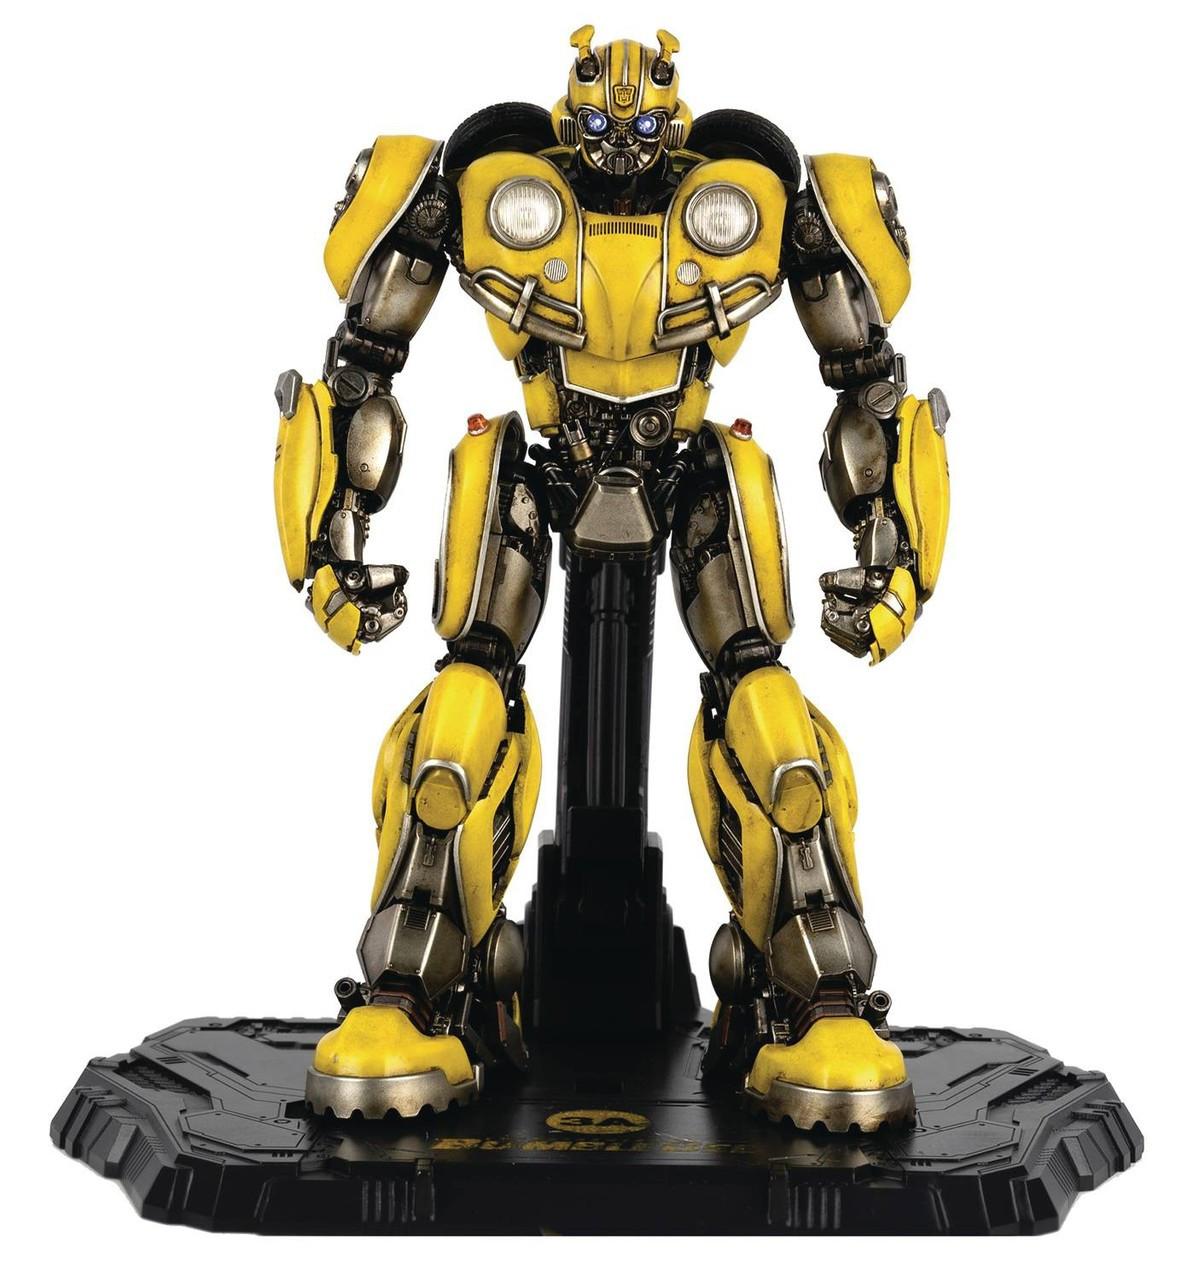 Transformers Bumblebee Movie Bumblebee 8 Deluxe Scale Figure 2018